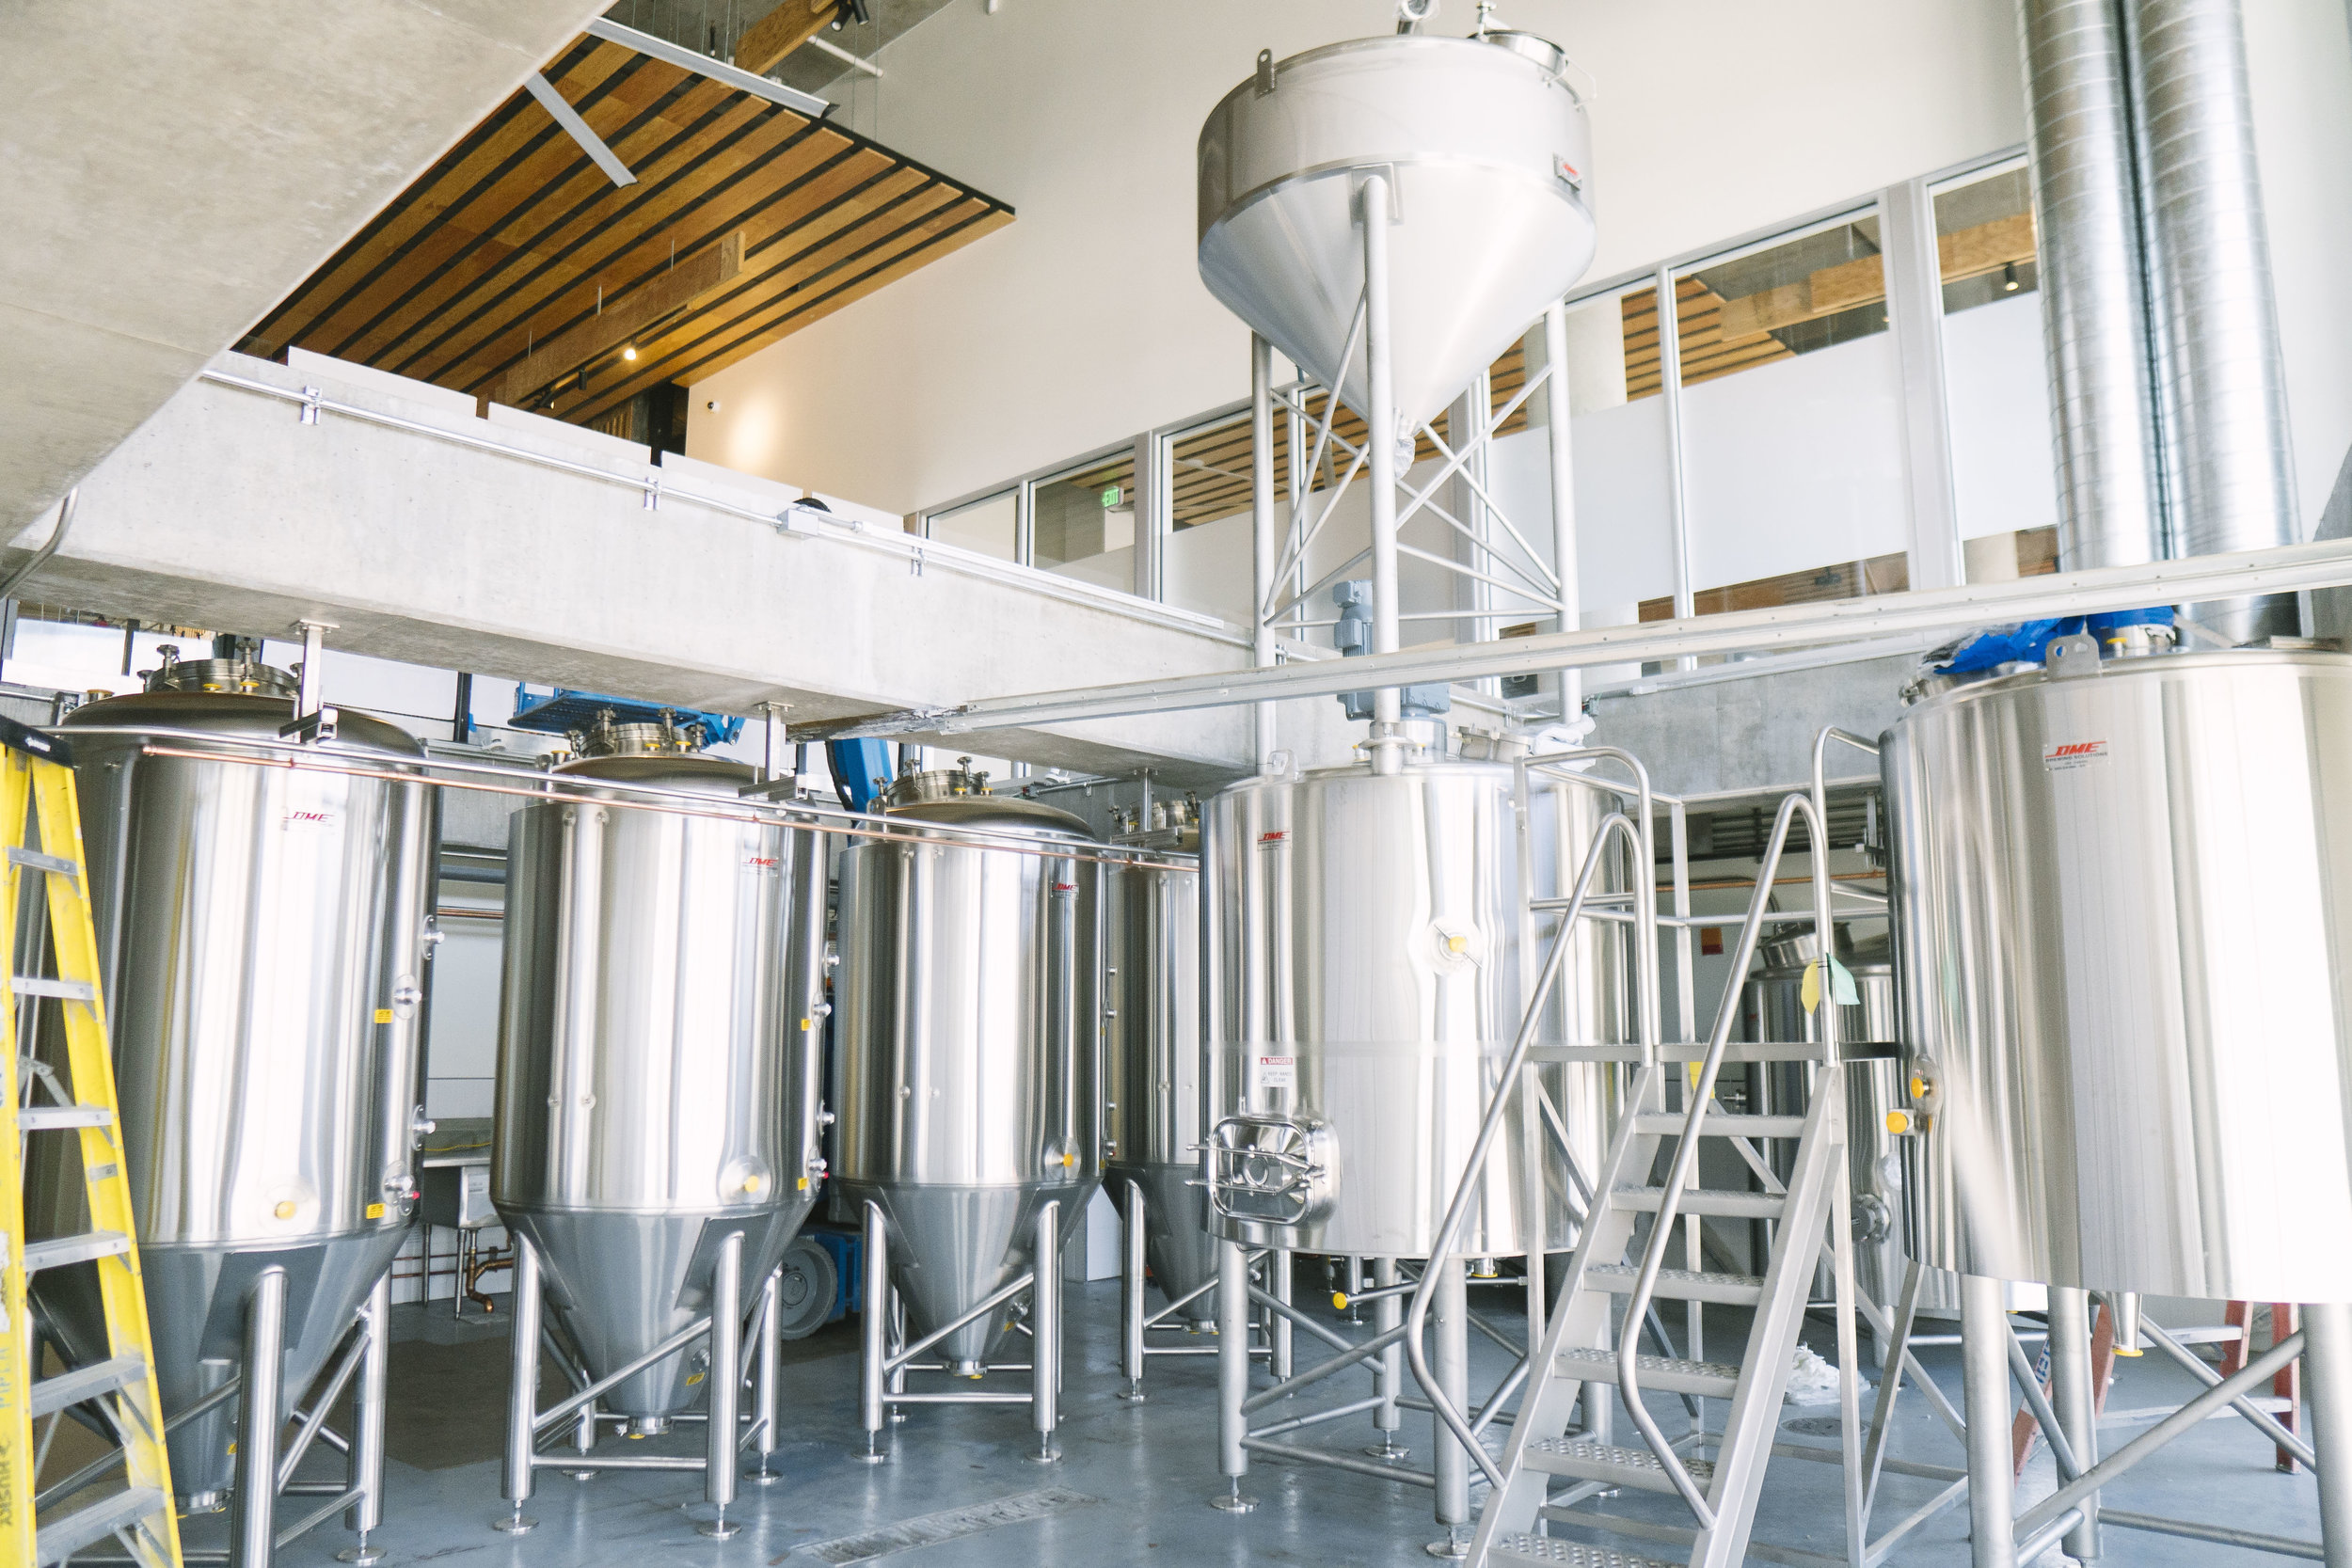 Photo Credit: New Belgium Brewing Company 2019